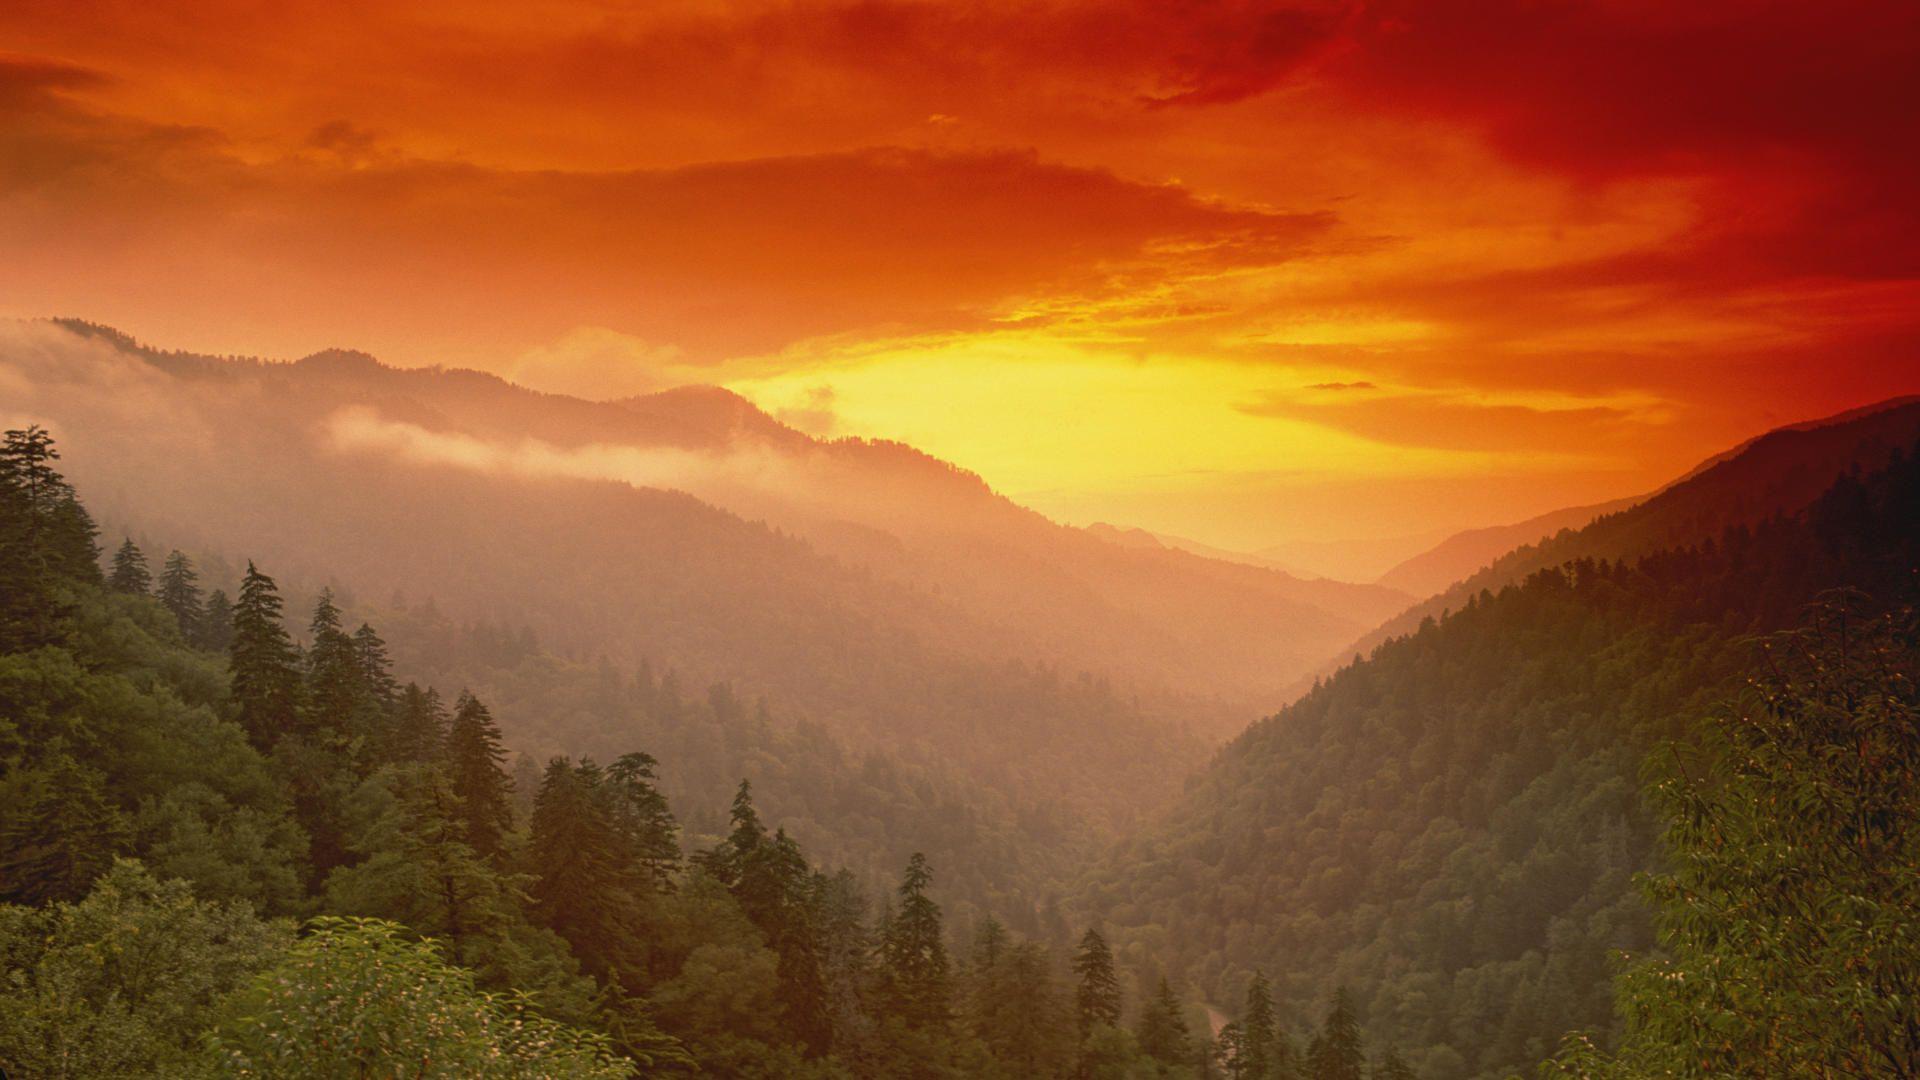 Smoky Mountains Wallpaper Smoky Mountains Great Smoky Mountains National Park National Parks